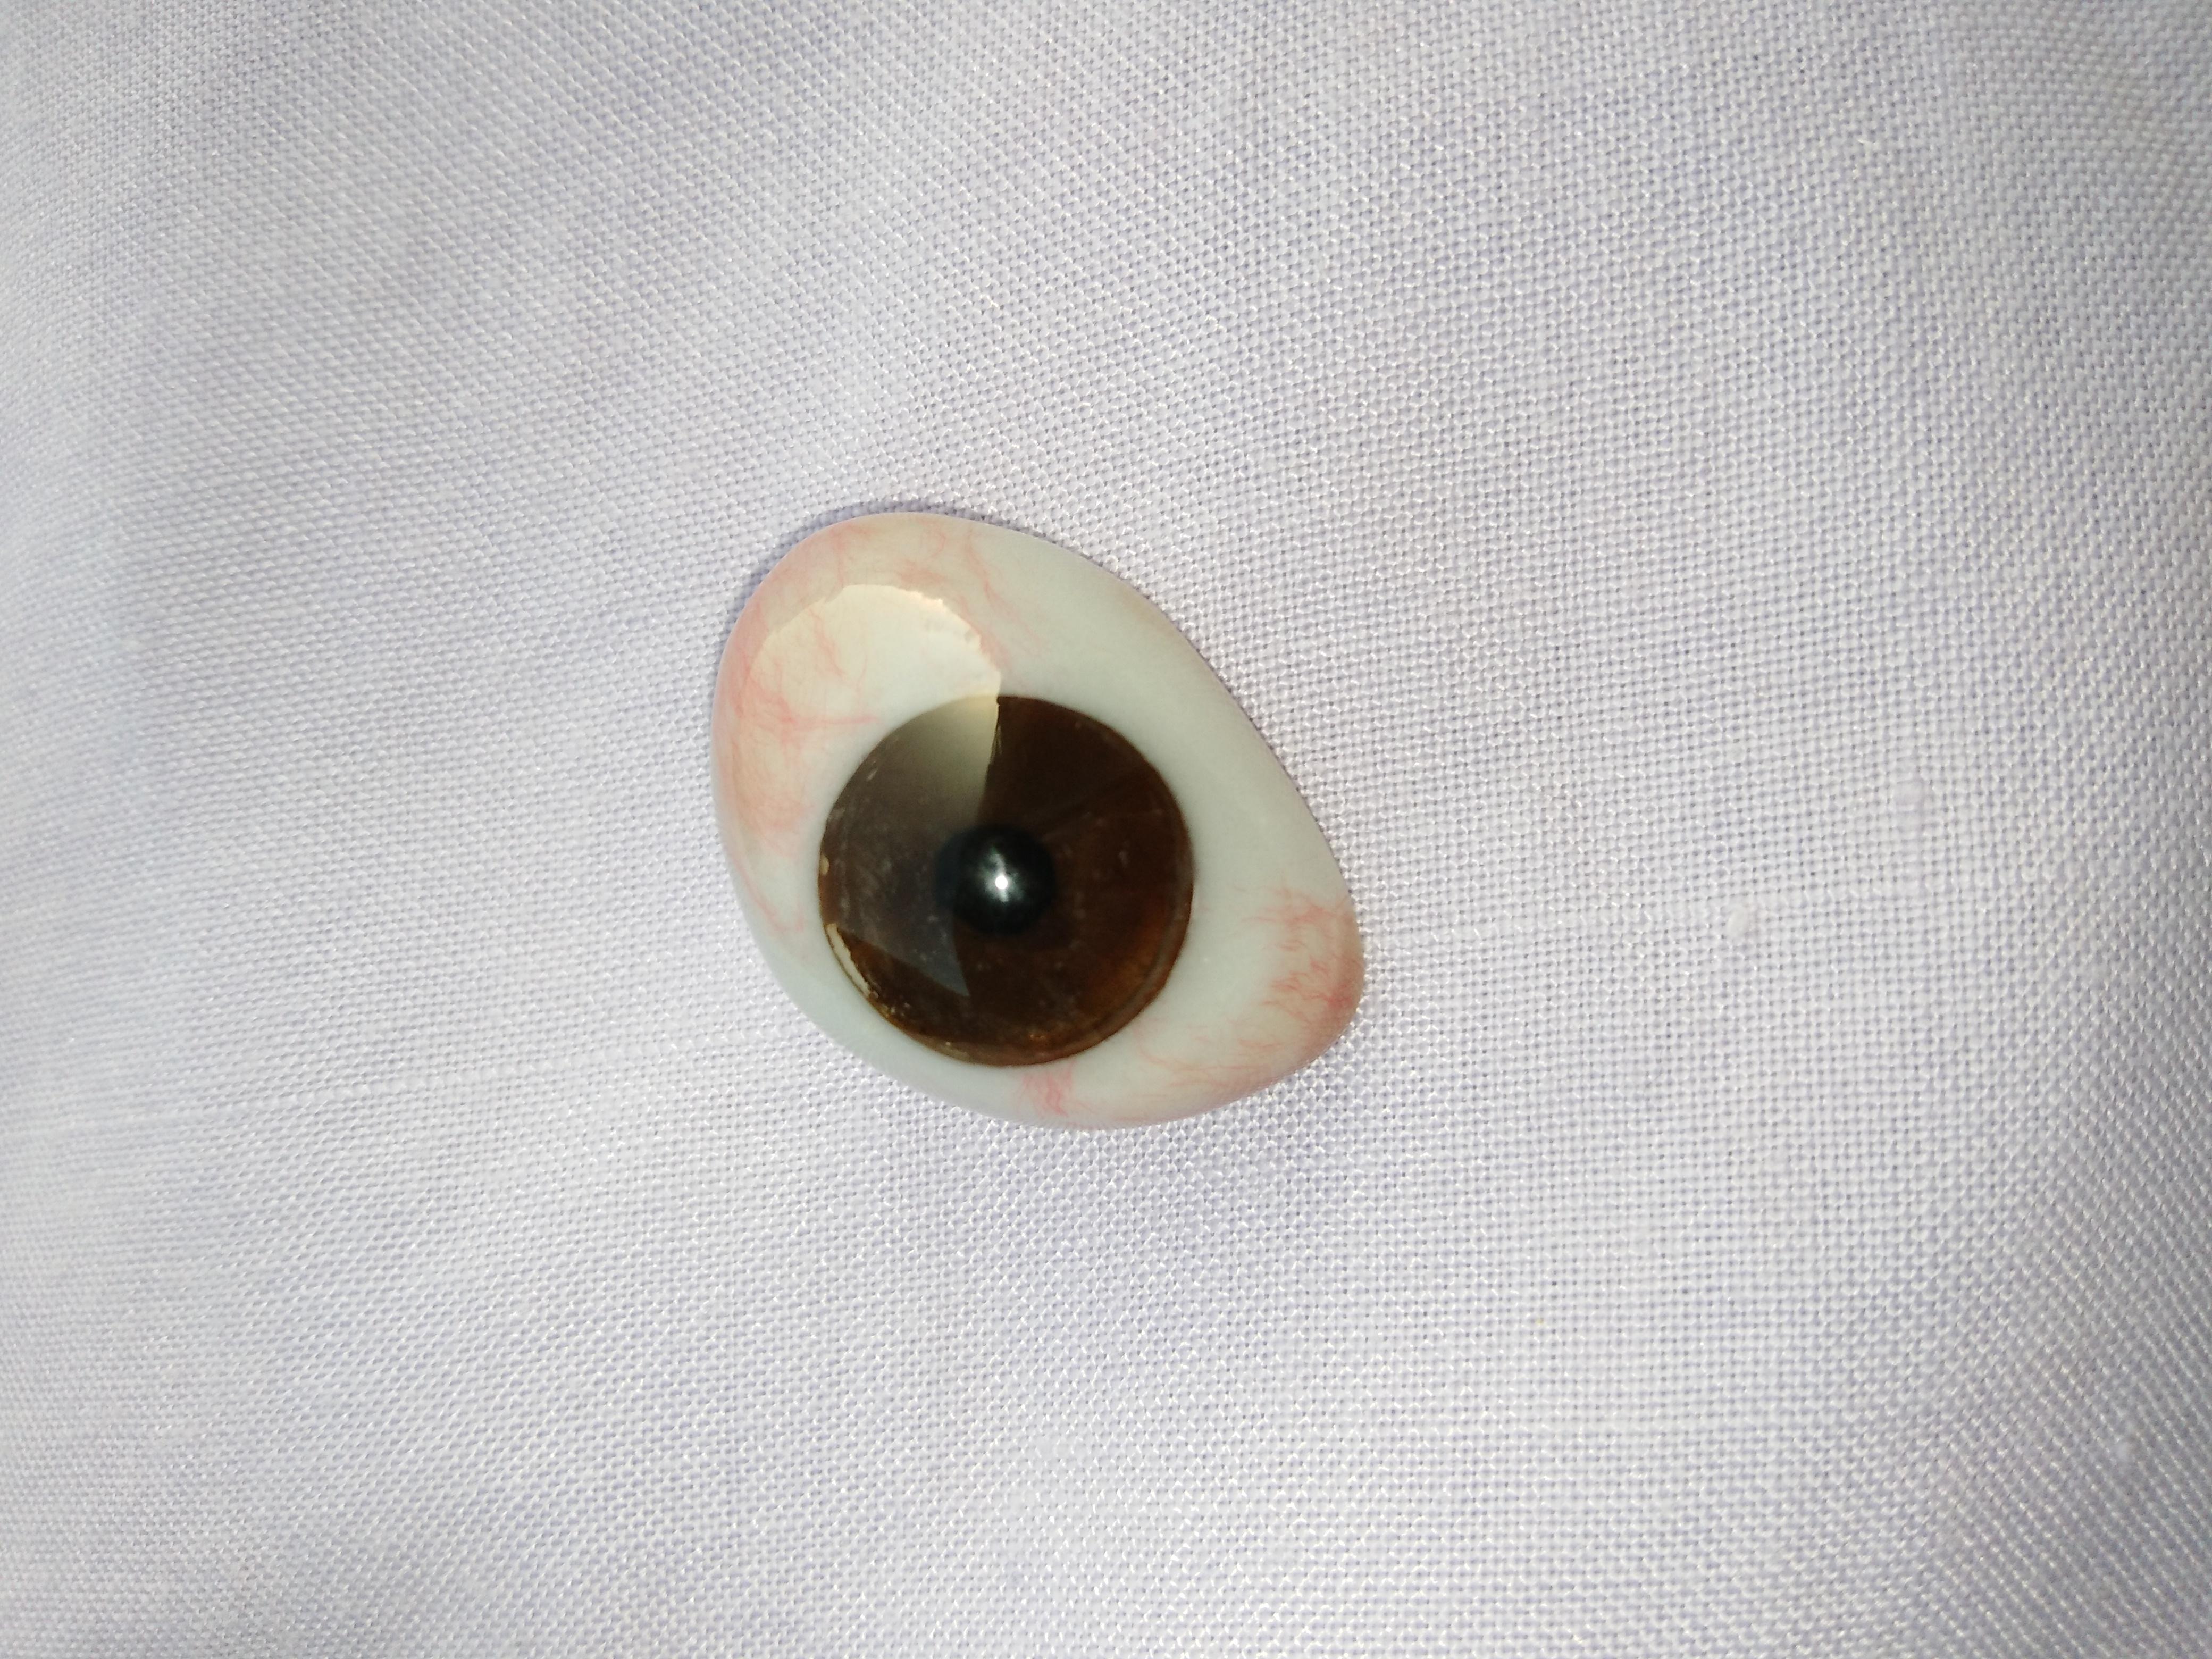 49be9d962c9 Ocular prosthesis - Wikipedia